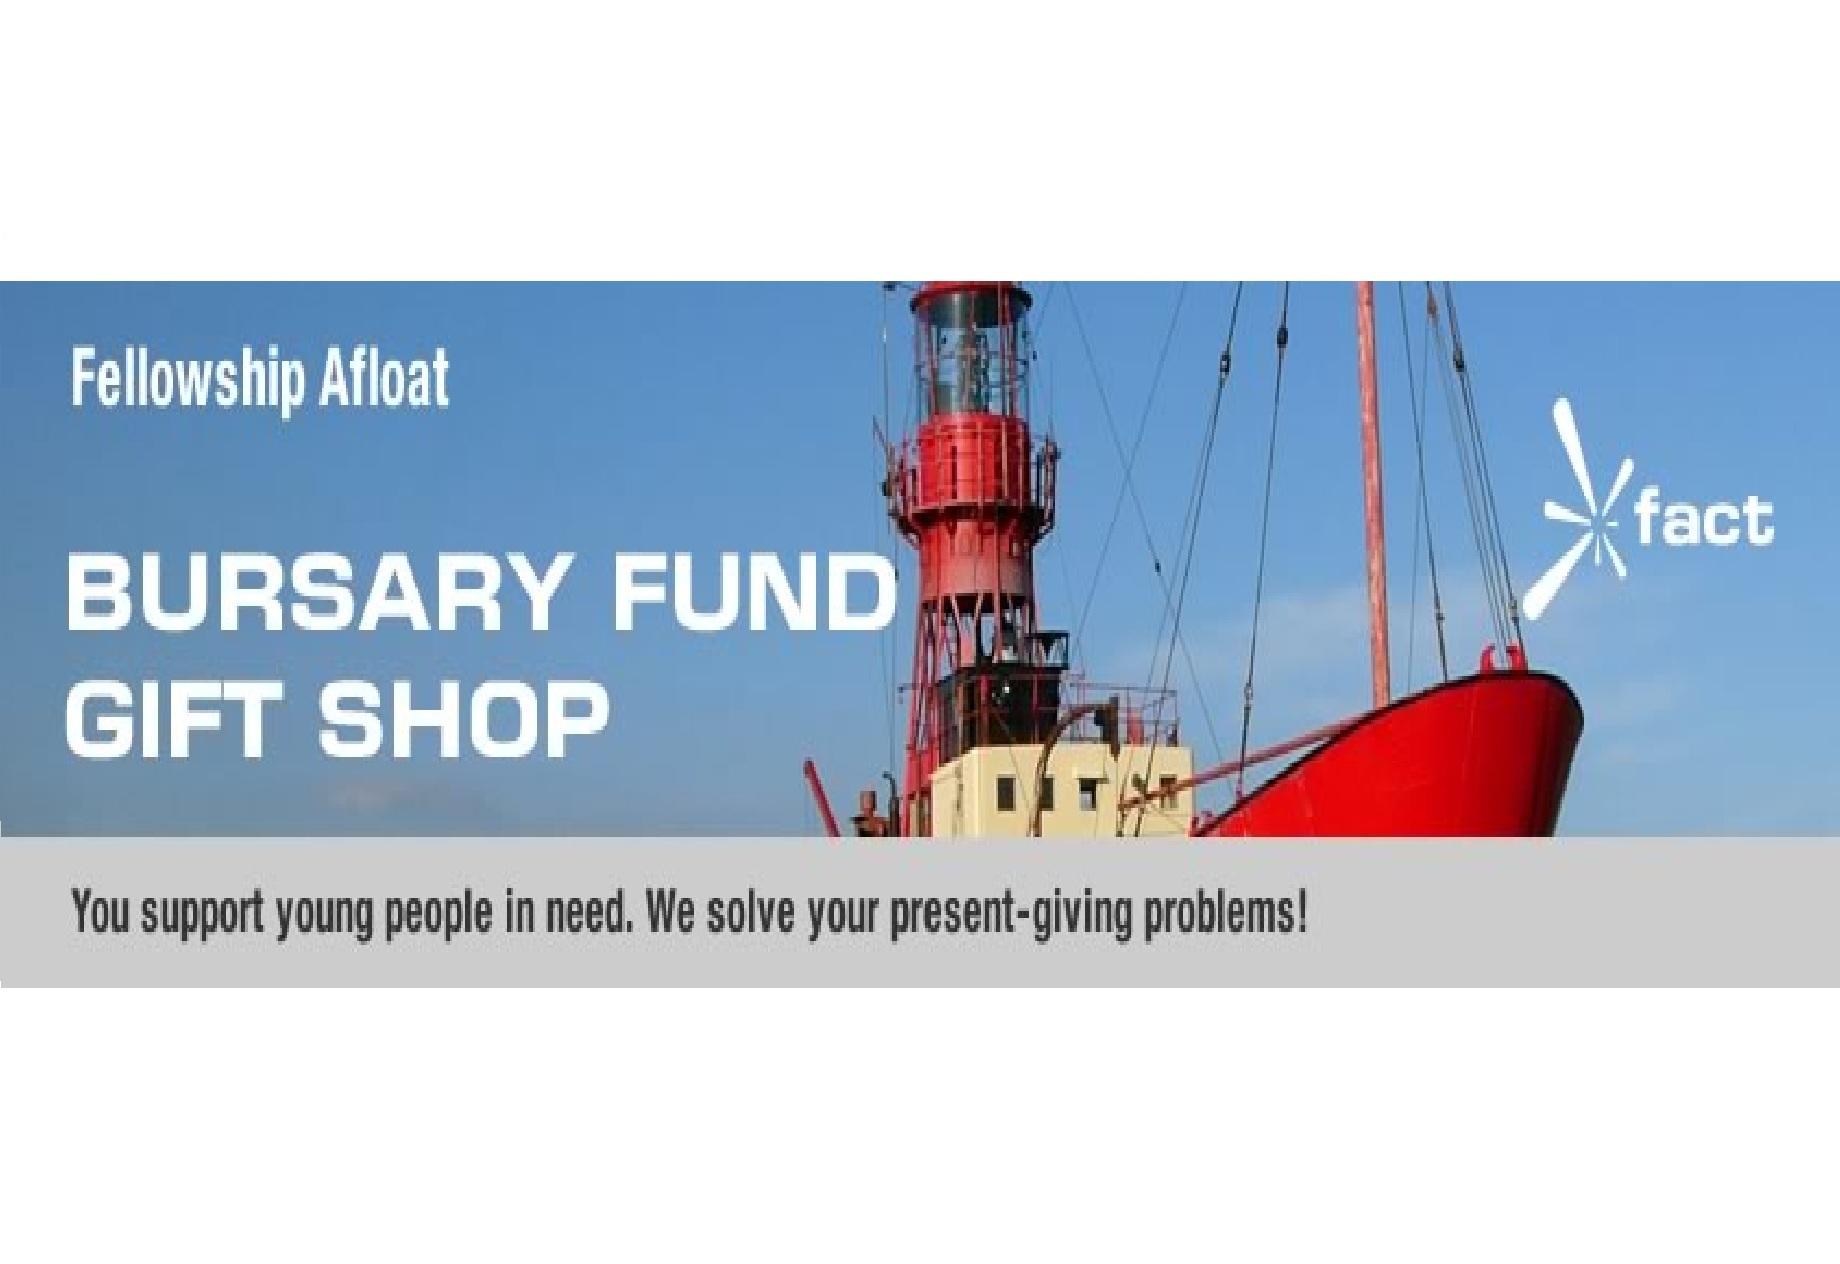 Bursary Gift Shop